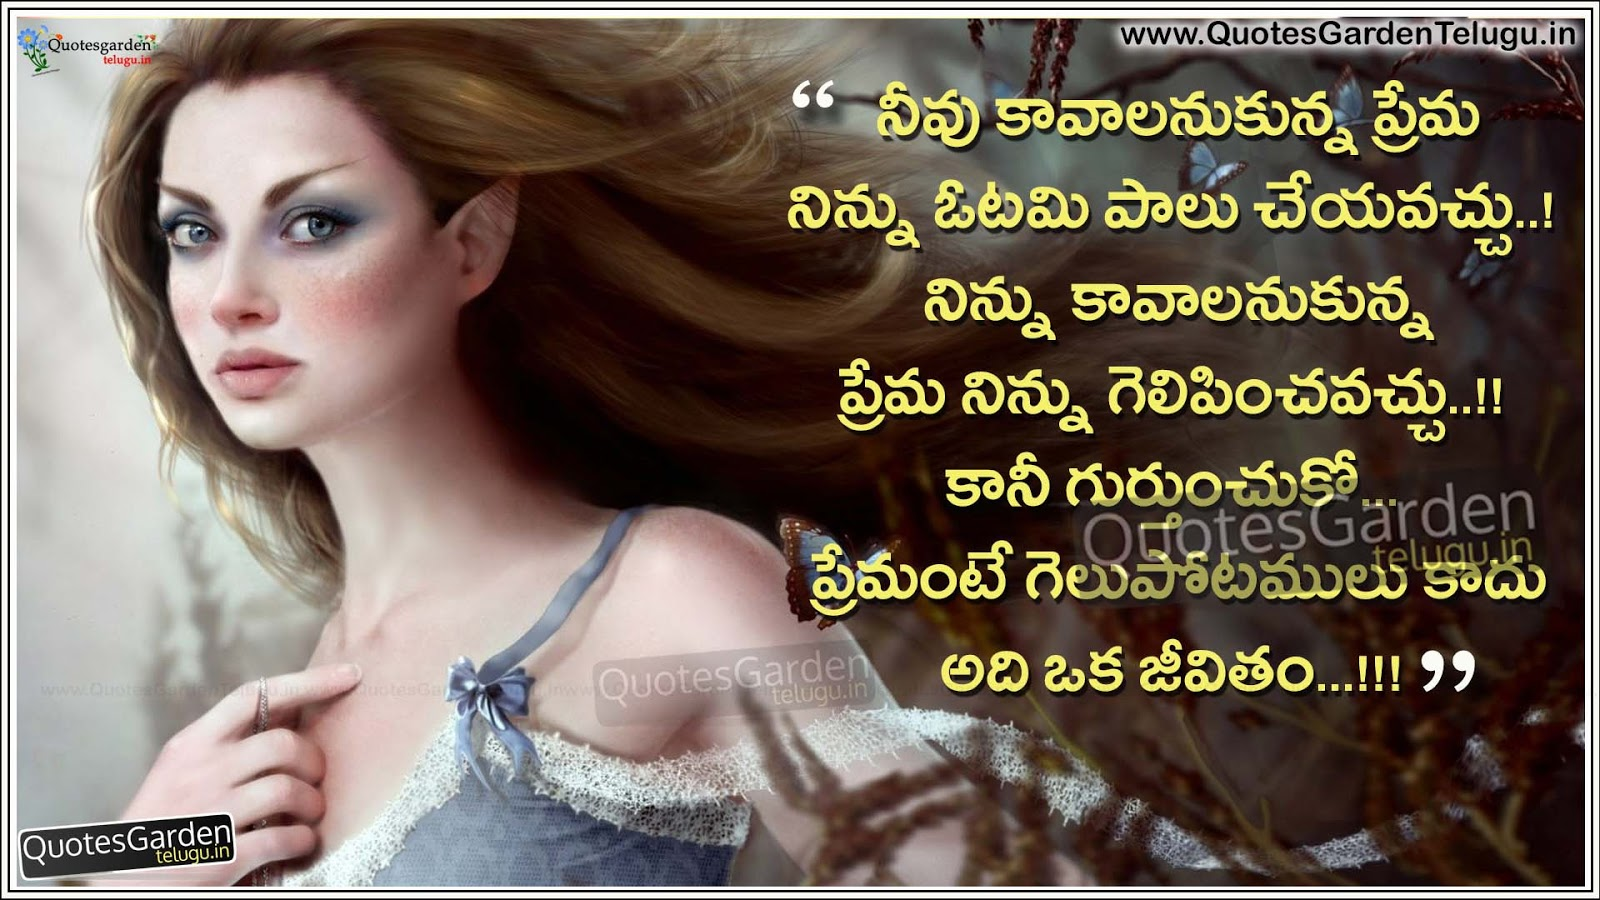 Love And Life Telugu Best Status Messages Quotes Garden Telugu